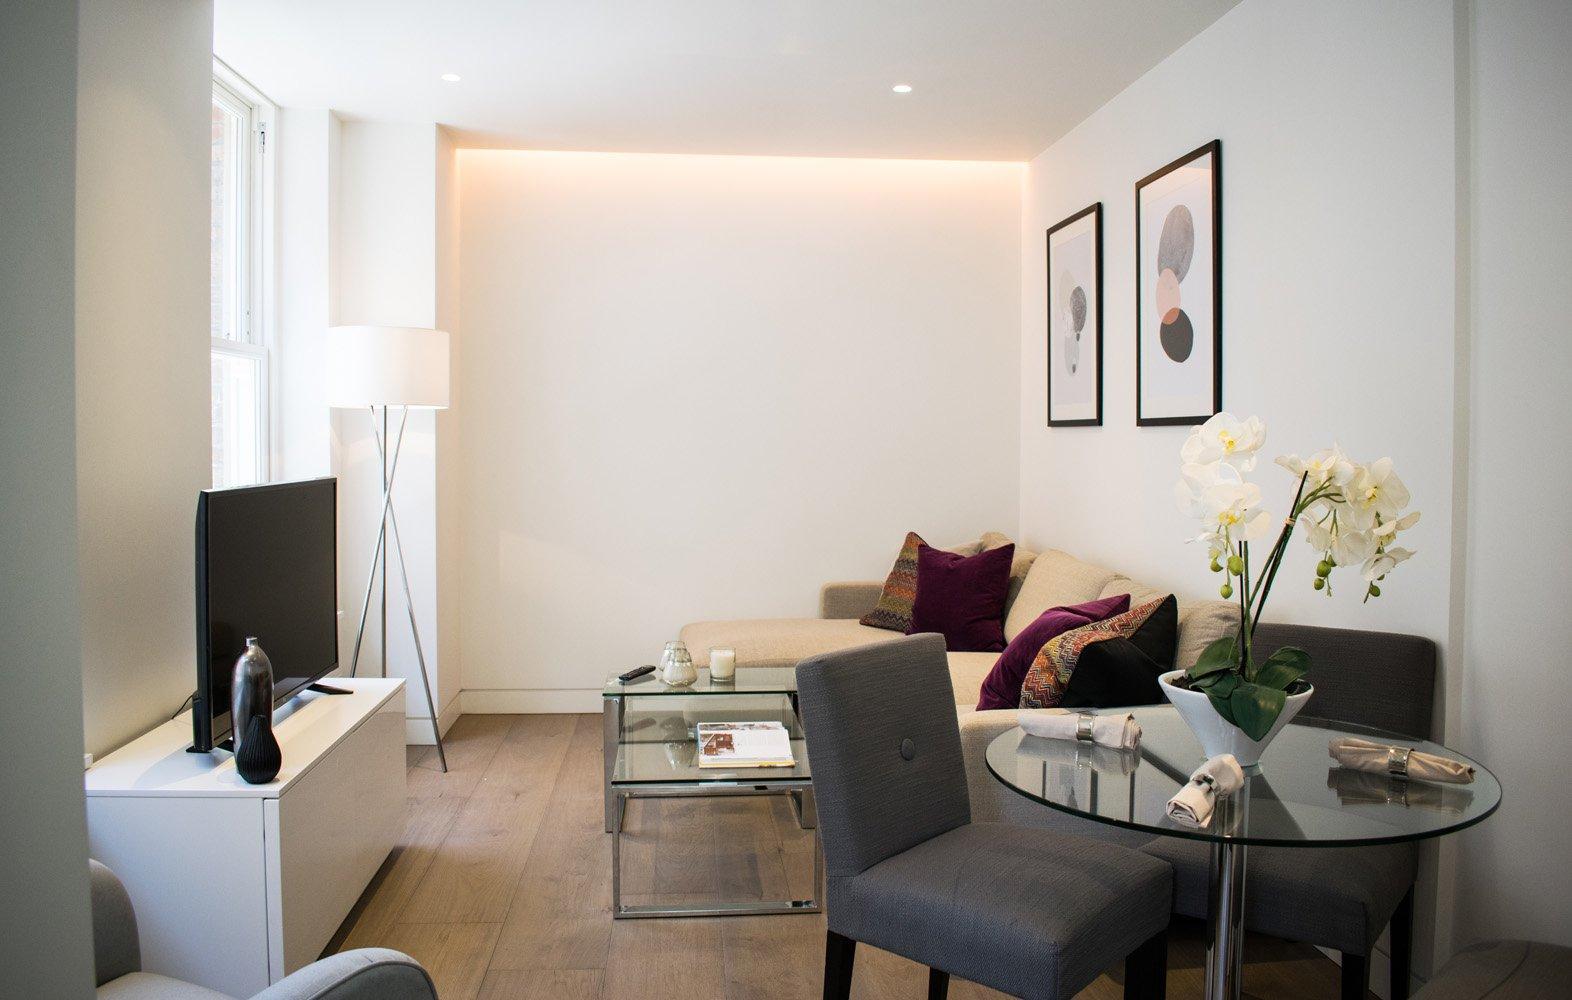 Marylebone-Luxury-Accommodation-Central-London-Serviced-Apartments-Near-Oxford-Street,-Bond-Street-&-Hyde-Park-Urban-Stay